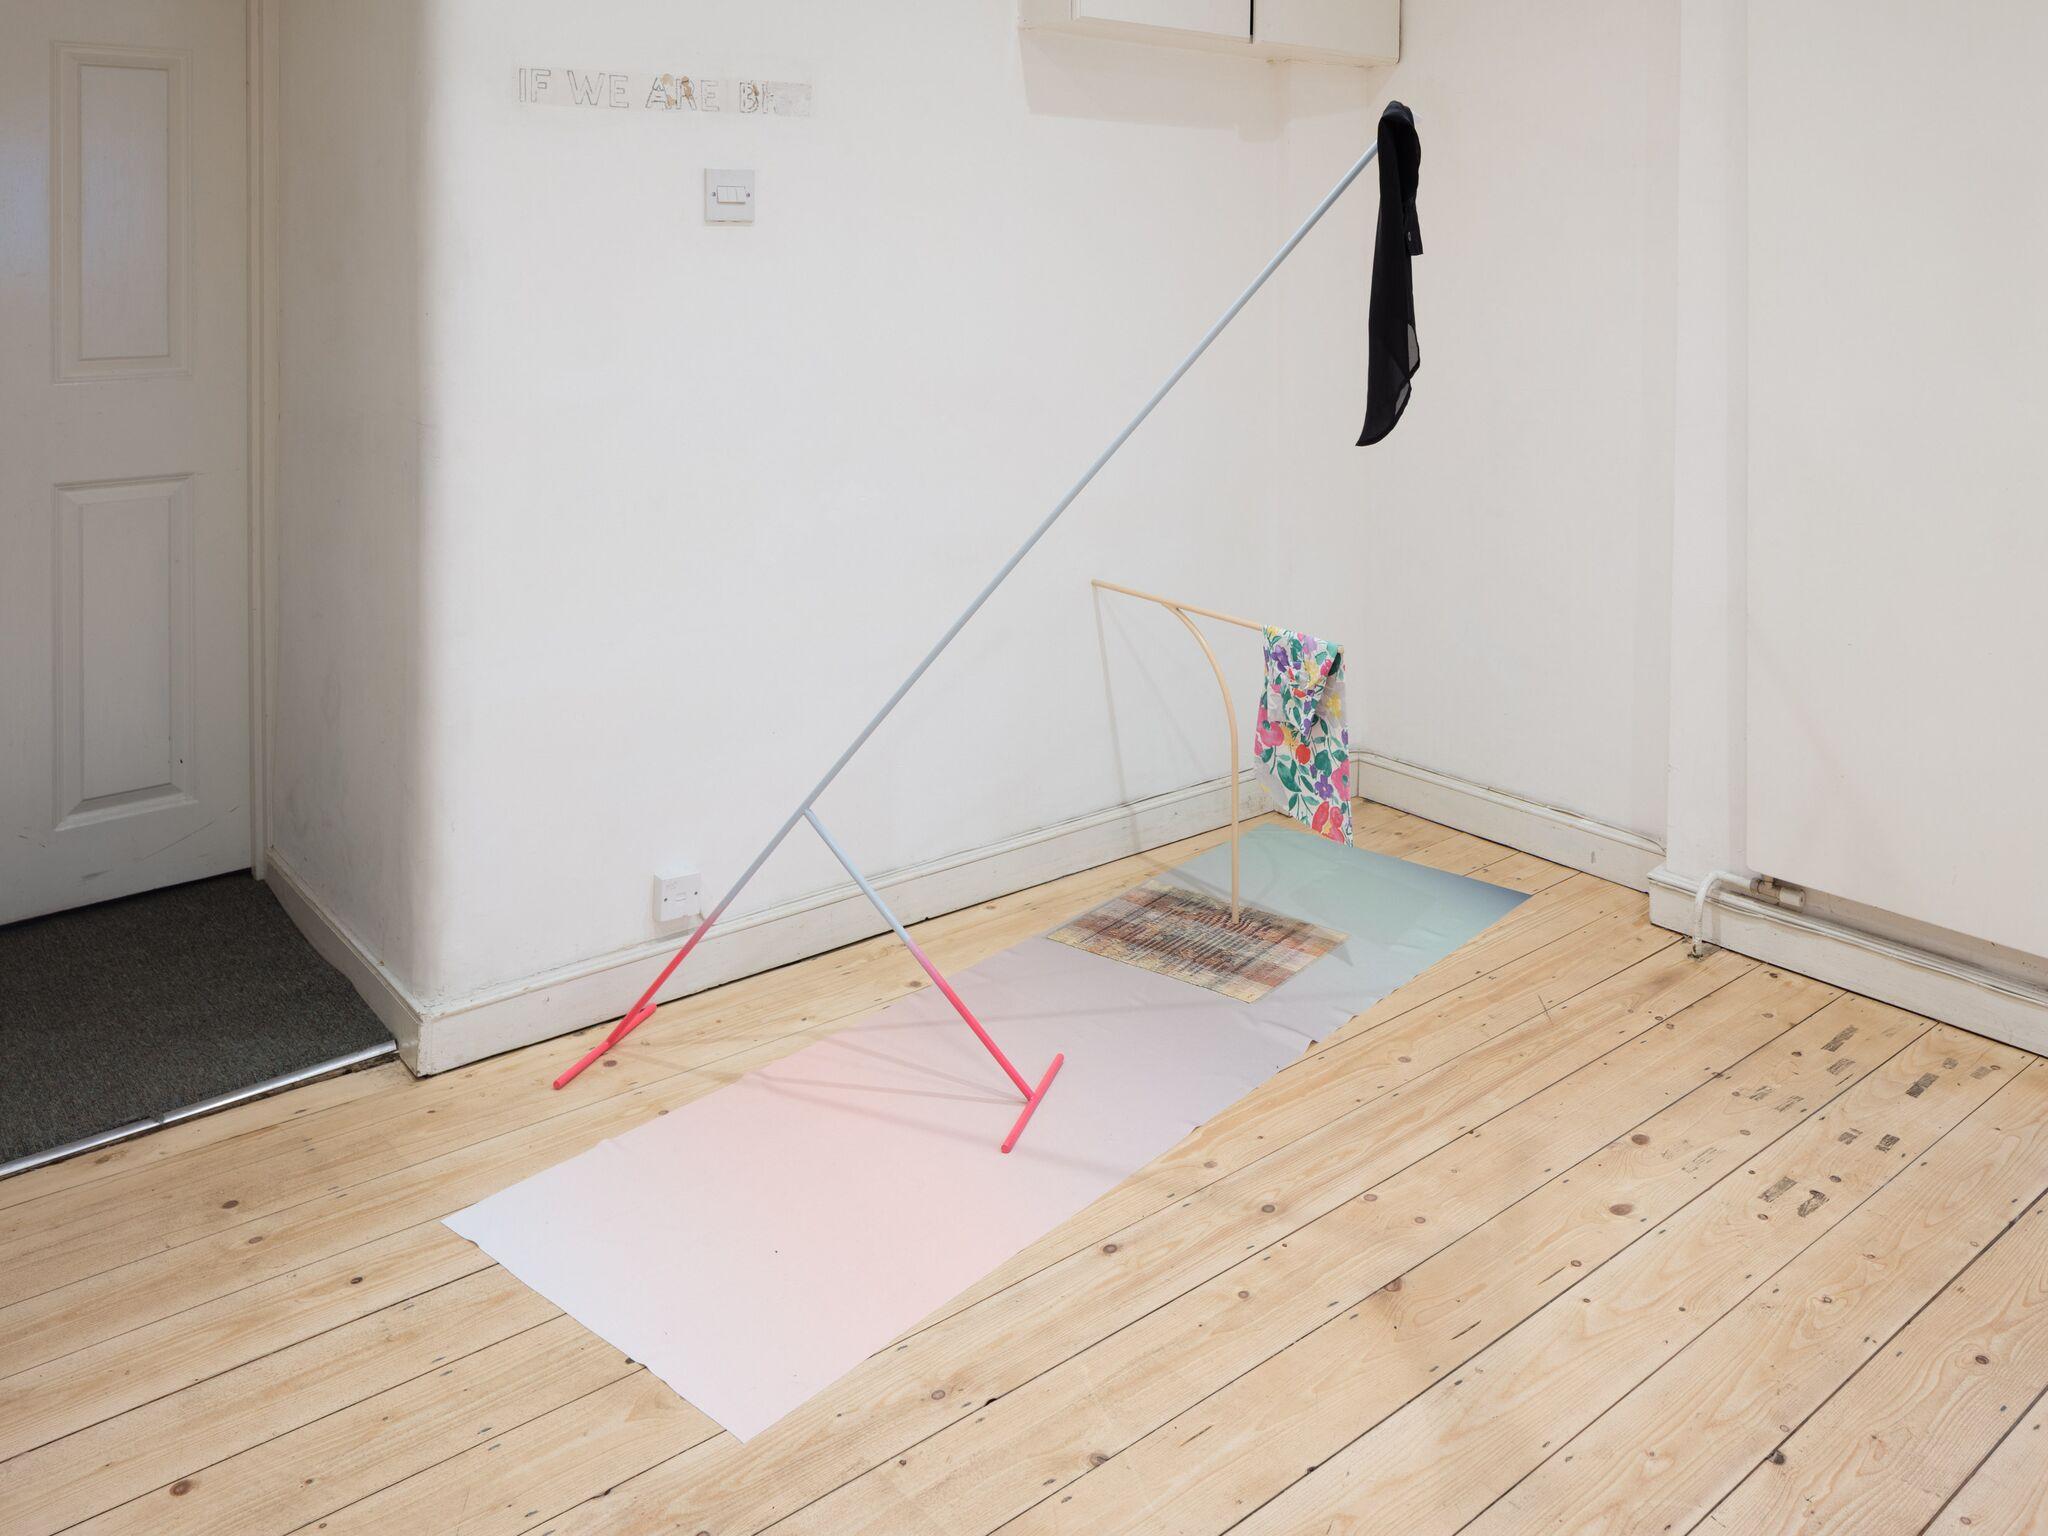 Ben Cain, Passive Imperative Participation Vibe, installation view, 2018. Documentation: Plastiques Photography (Ben Cain - Passive Imperative Participation Vibe 13)